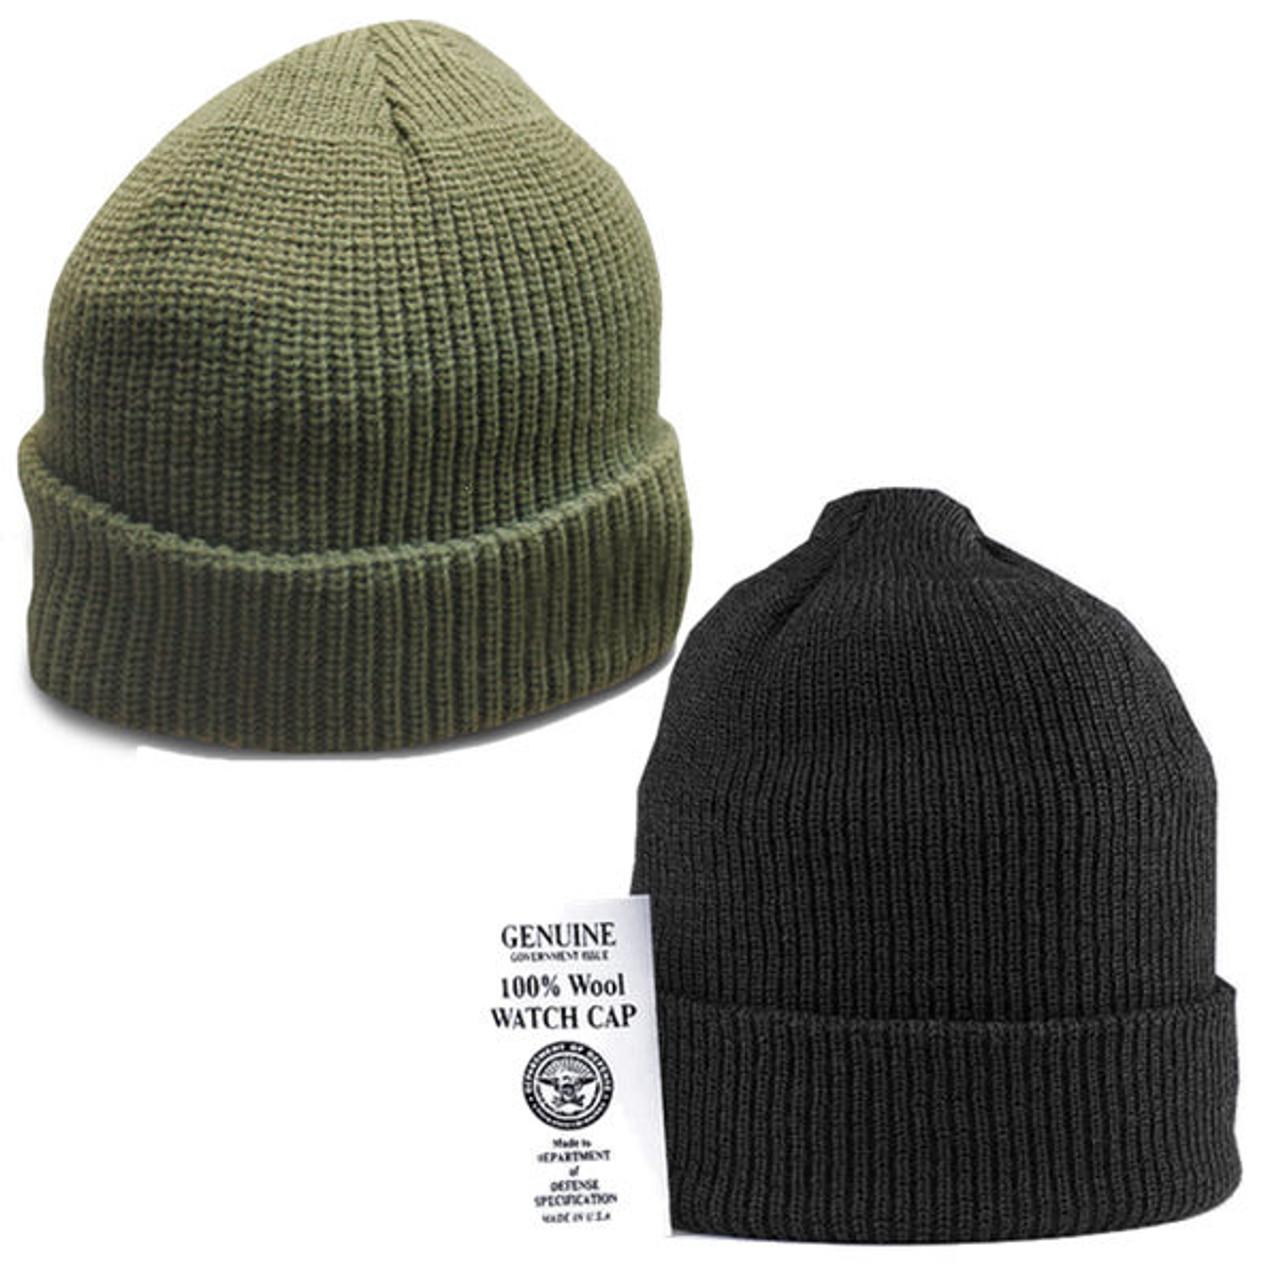 100% Wool Tactical Watch Cap  948bae209c8